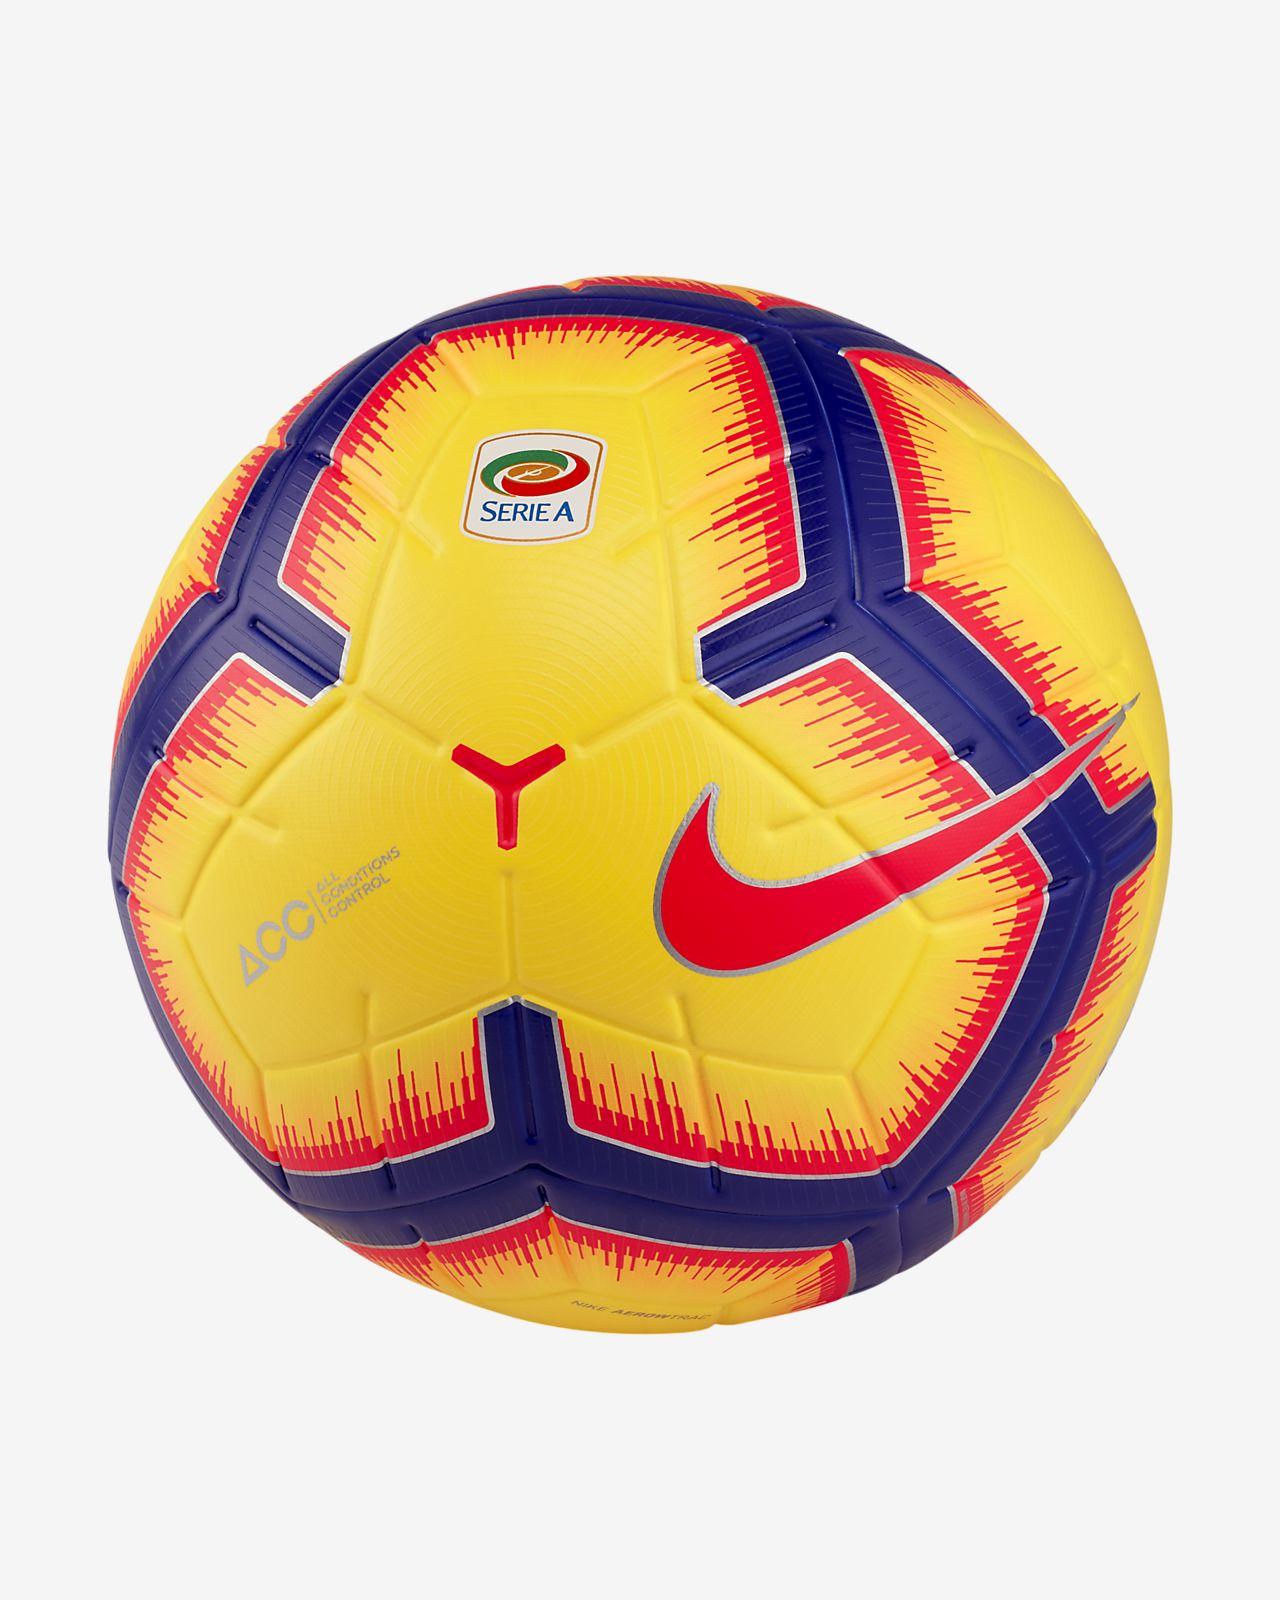 Serie A Merlin Football